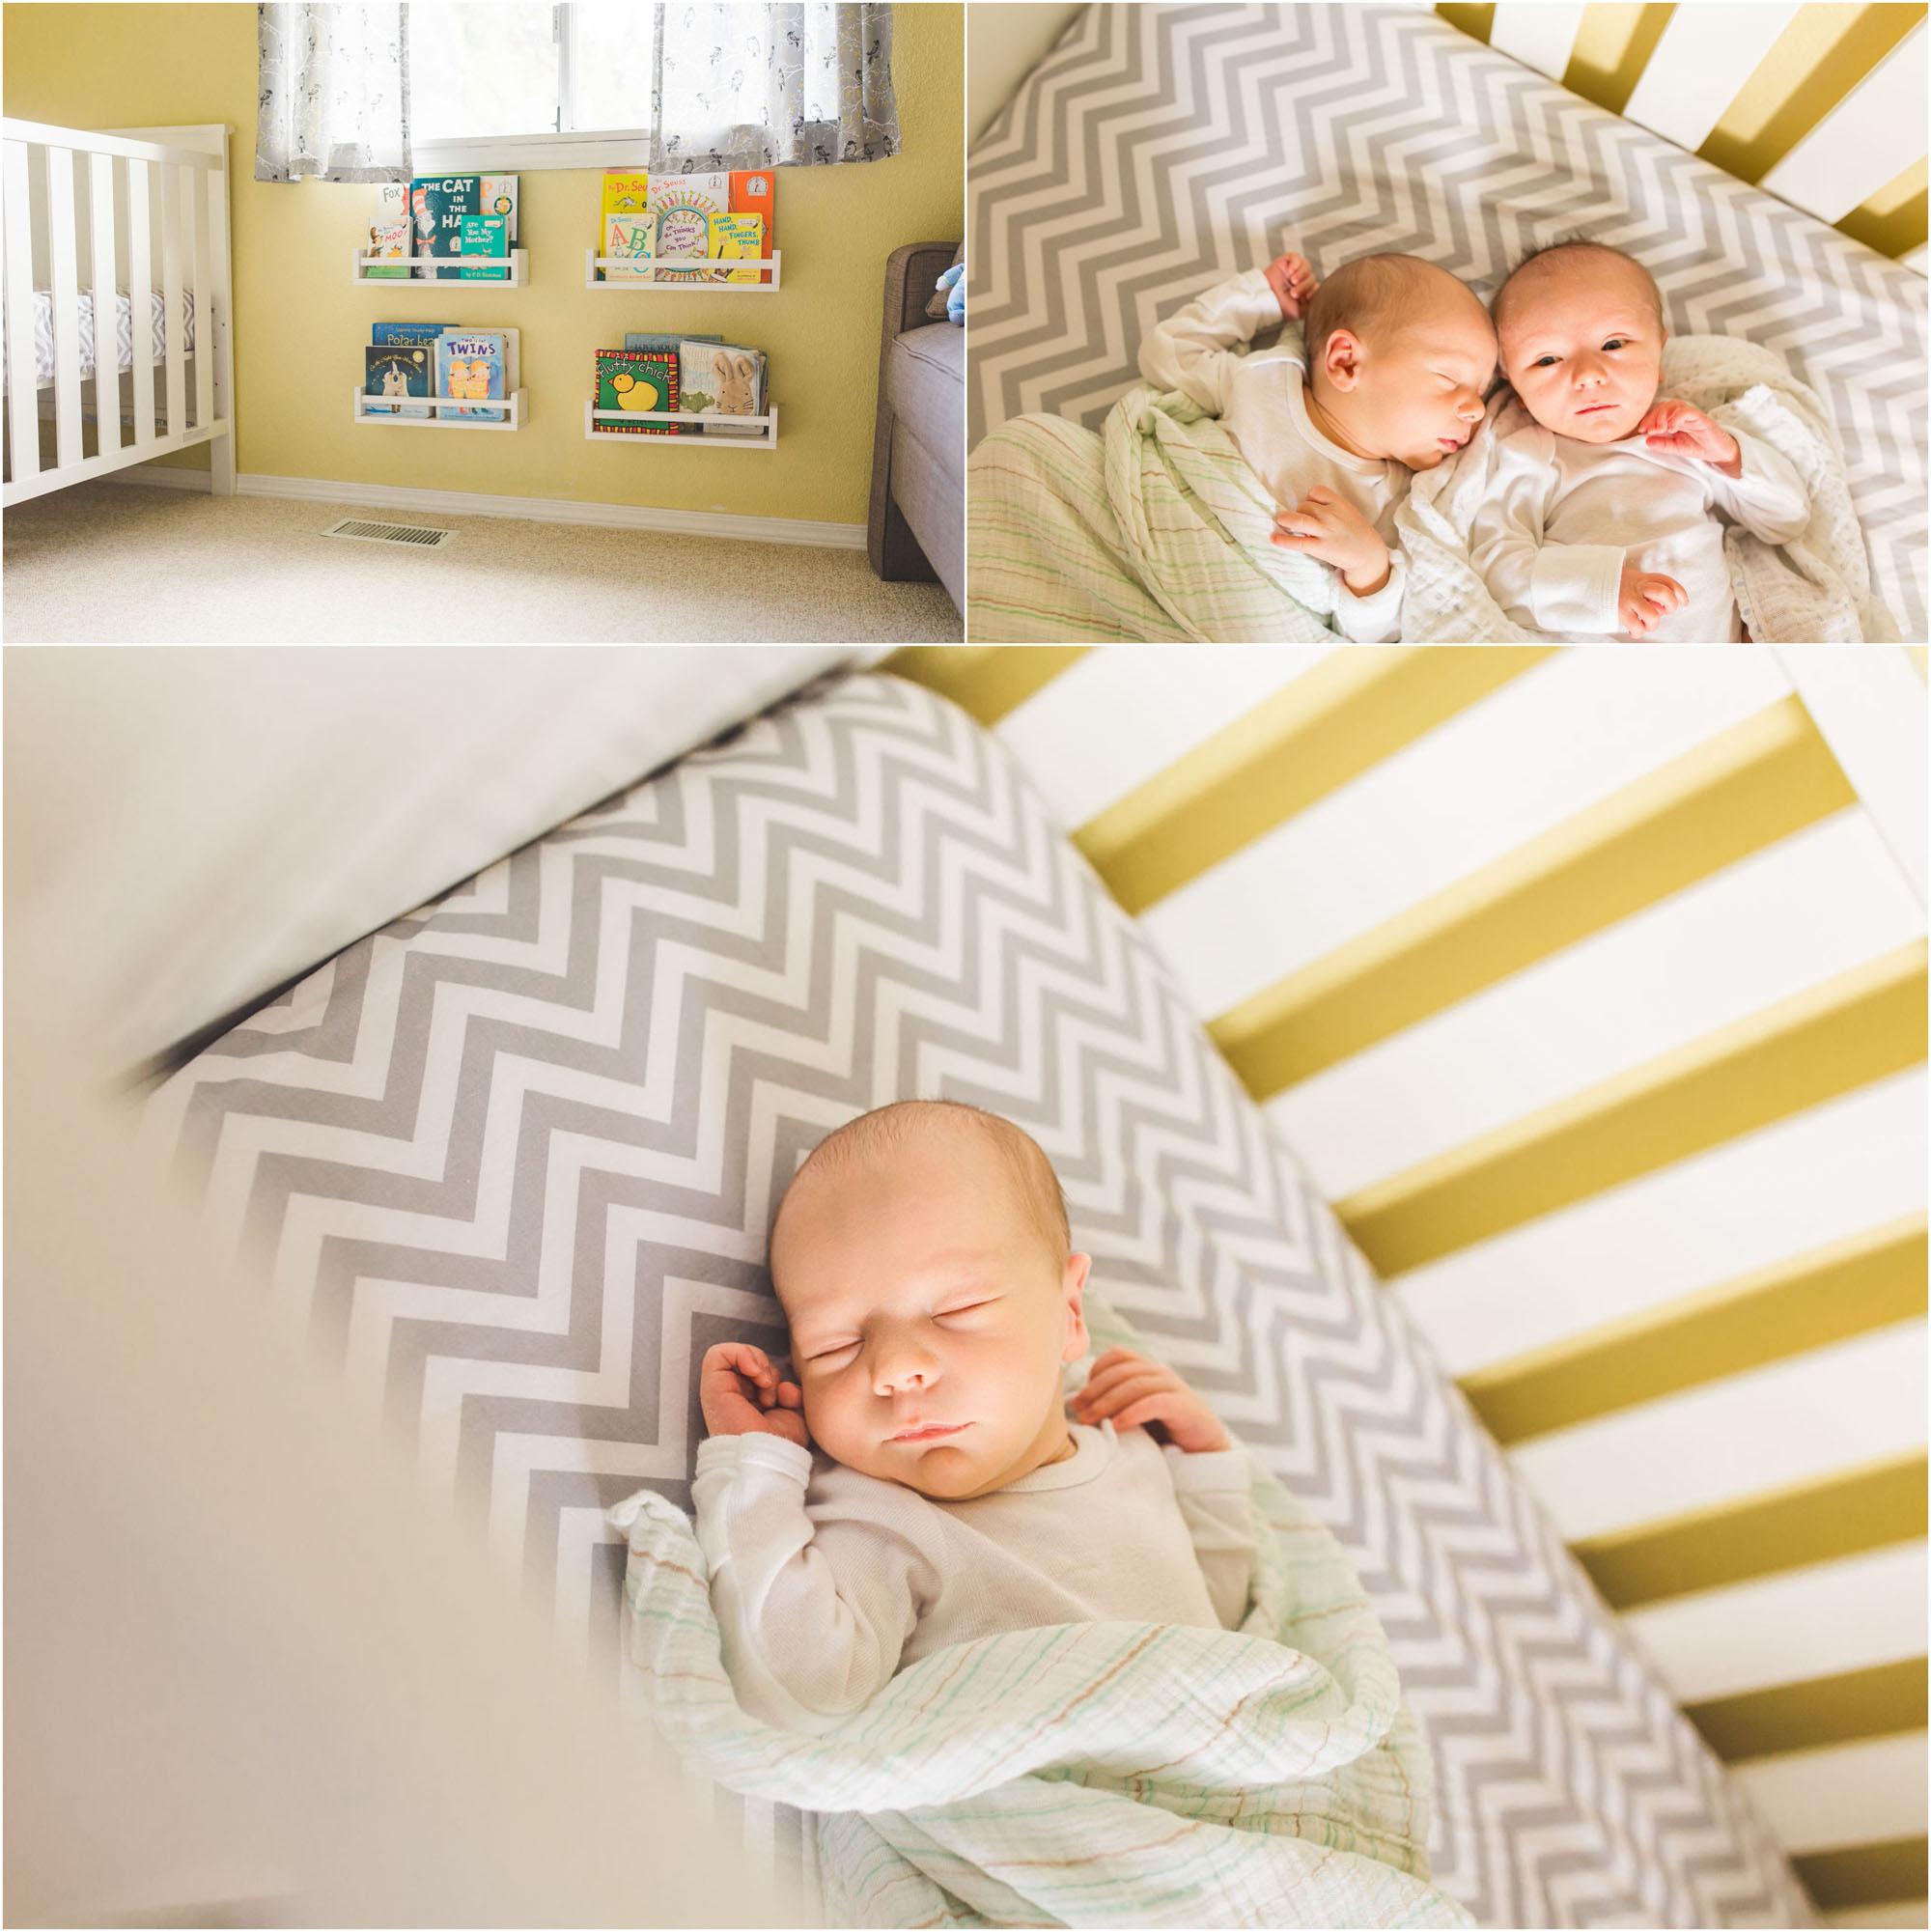 ashley vos photography seattle newborn photographer_0007.jpg